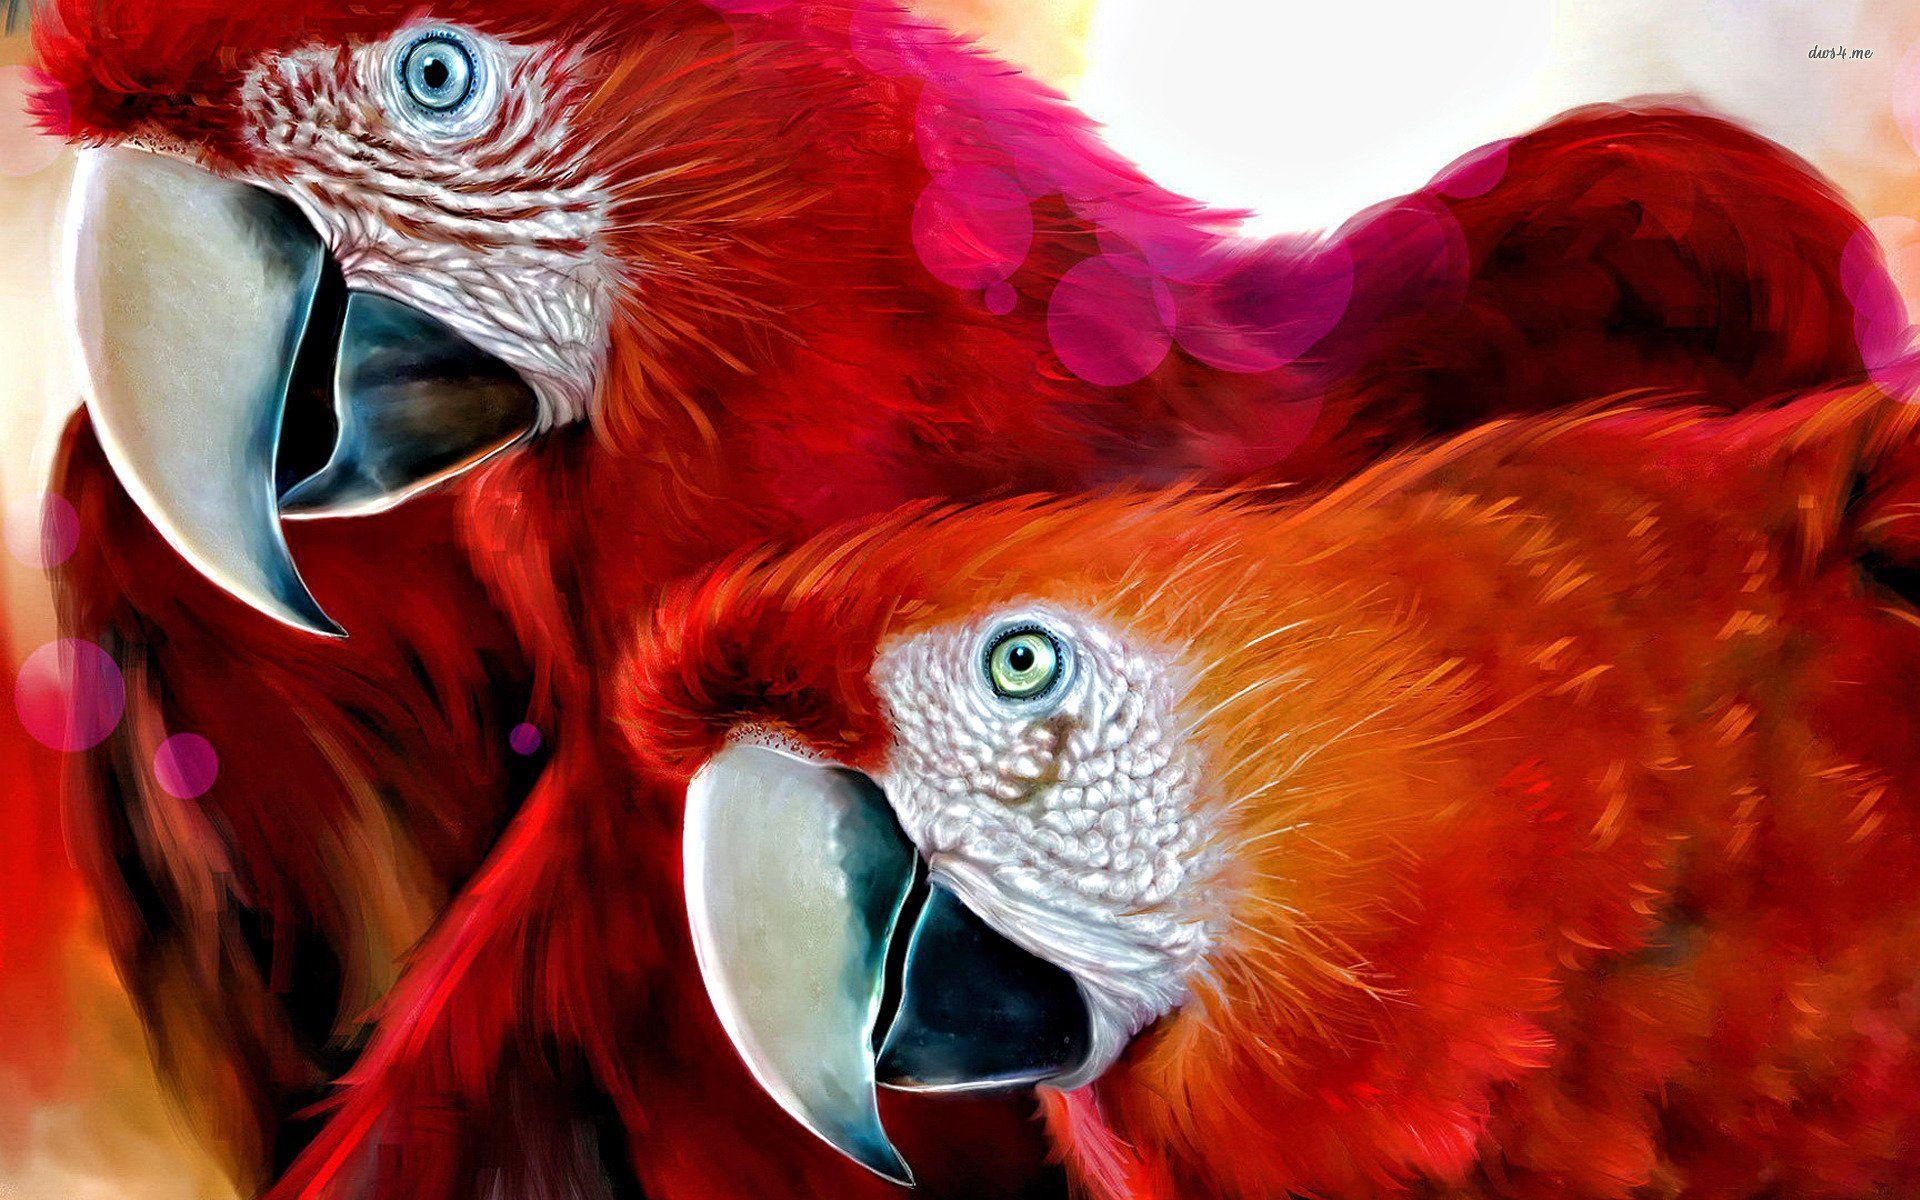 Scarlet Macaw Portrait Amazon Hd Wallpaper Free Download Scarlet Macaw Blue Macaw Parrot